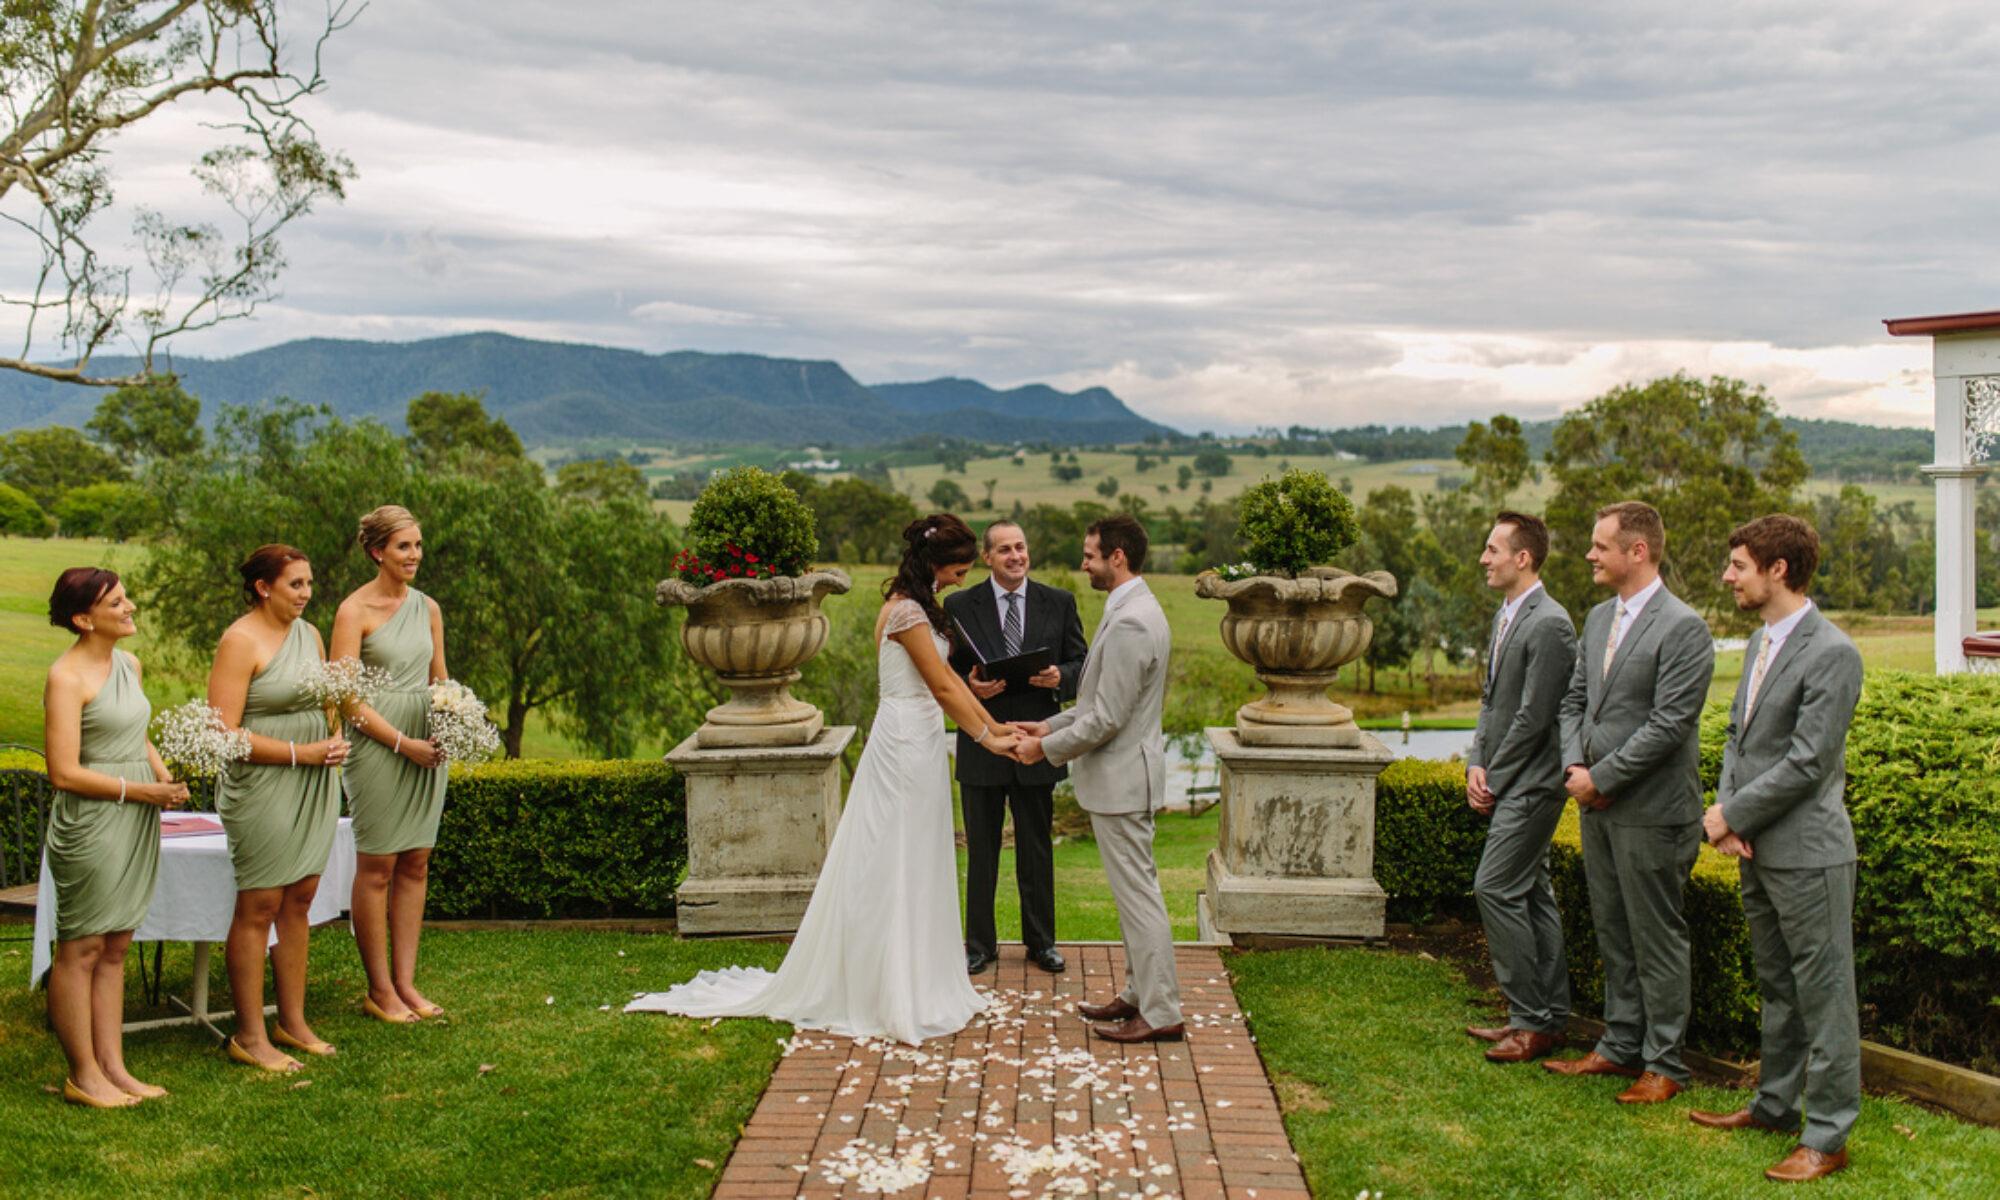 Jason Thomas - Hunter Valley Marriage Celebrant